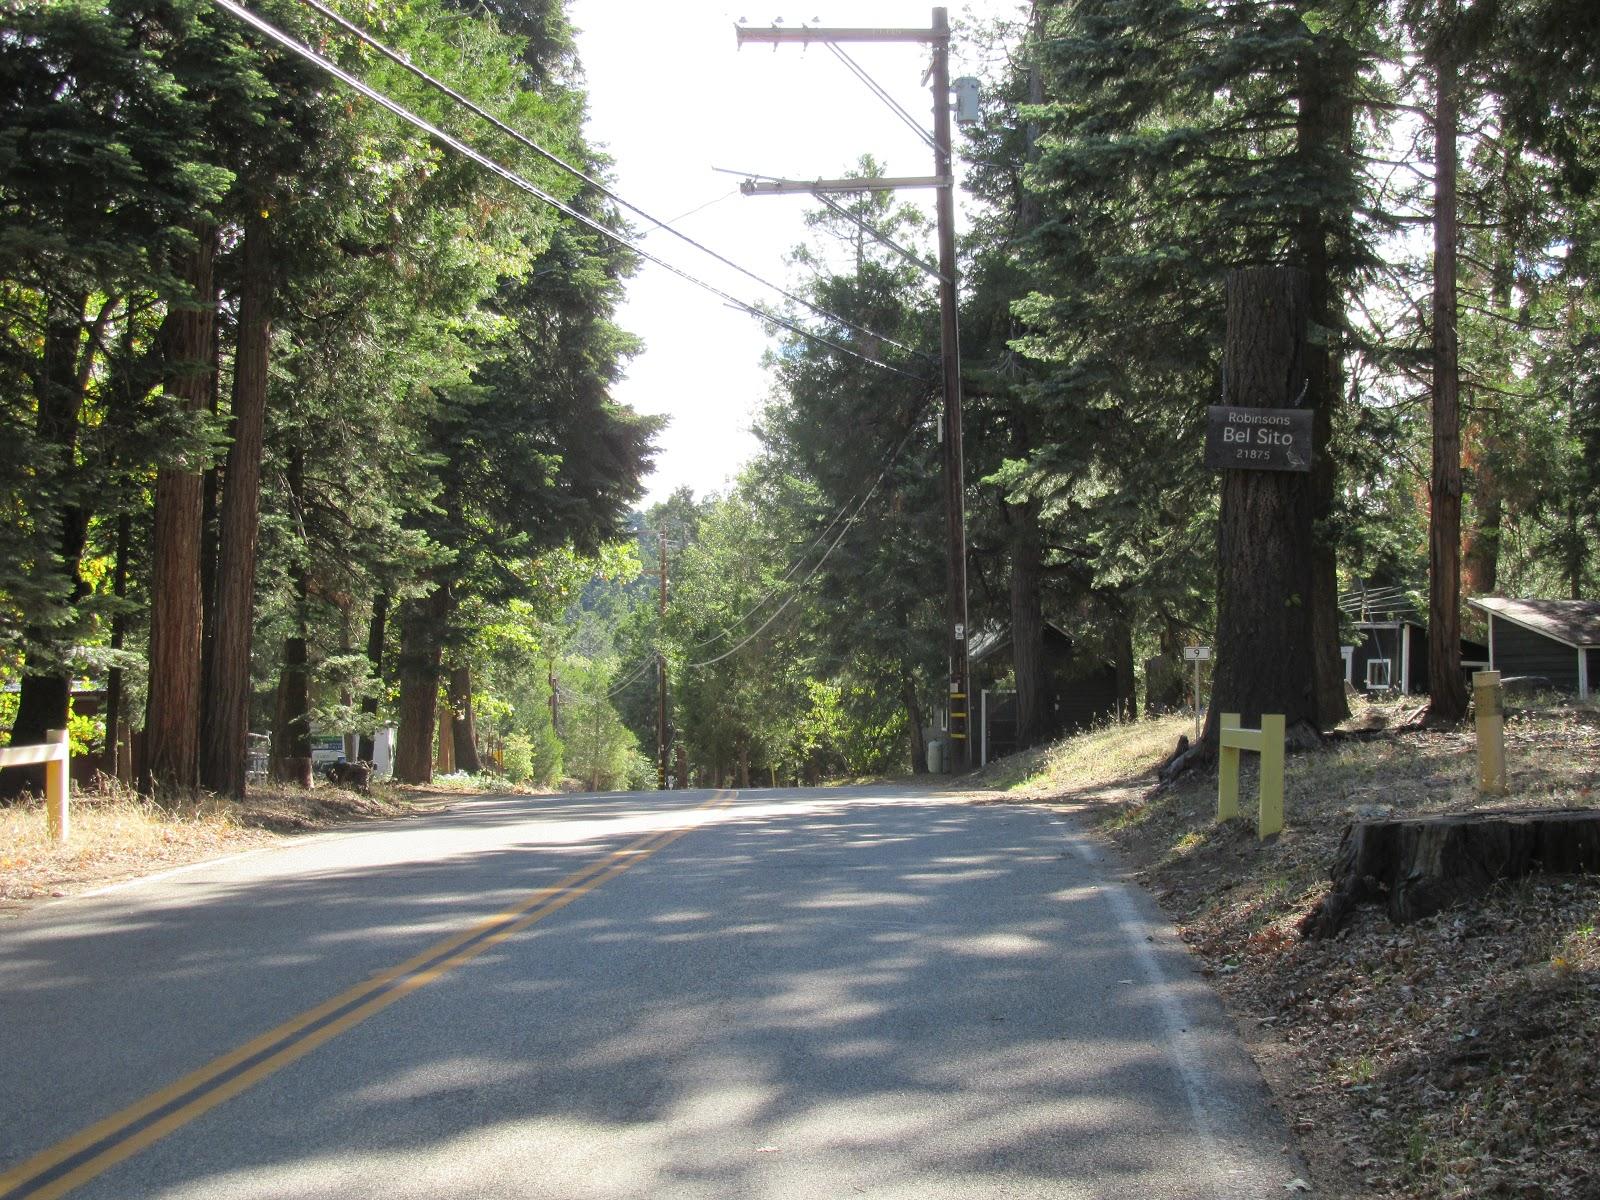 Crestline Road - finish of Mt Palomar bicycle climb